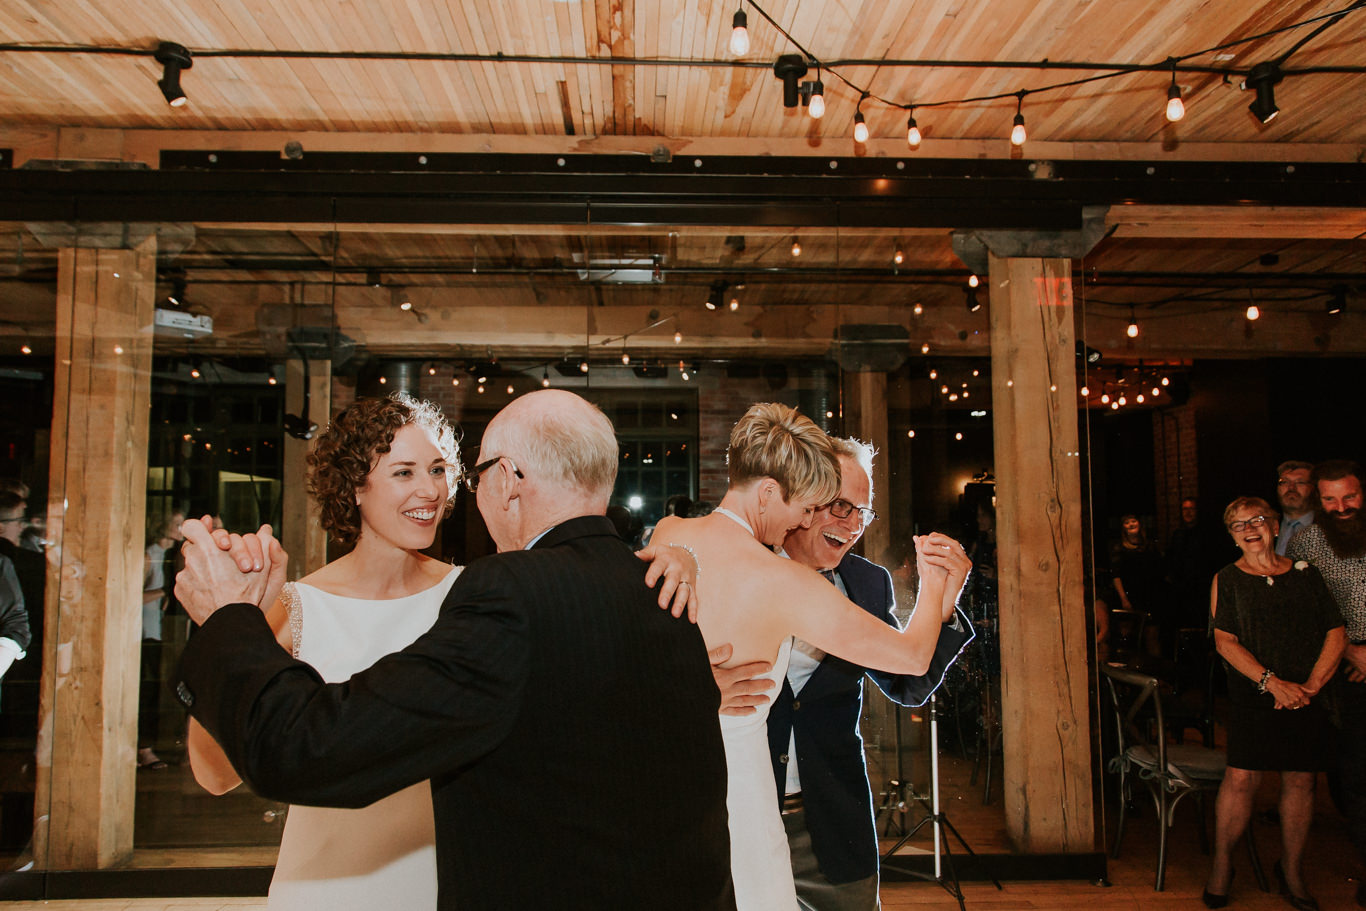 Lindsay-and-Heather-Charbar-Restaurant-Wedding-in-Calgary-214